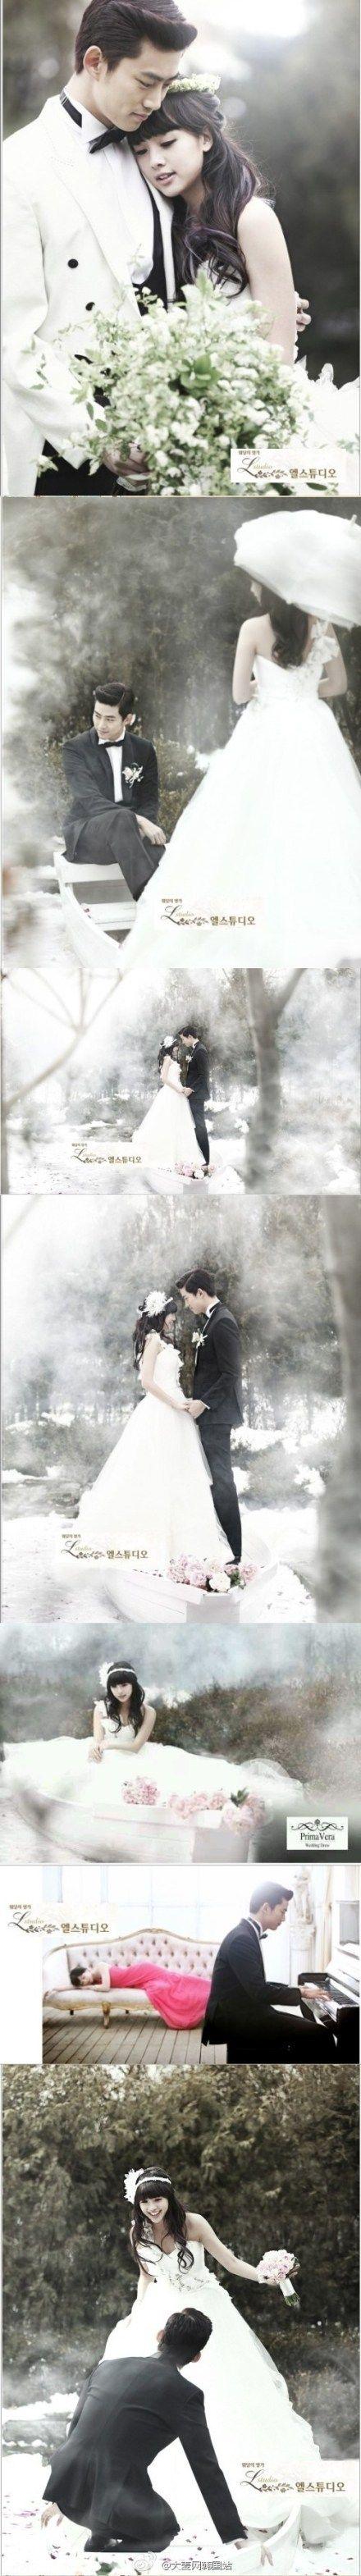 Love their wedding pics - We got married Intl